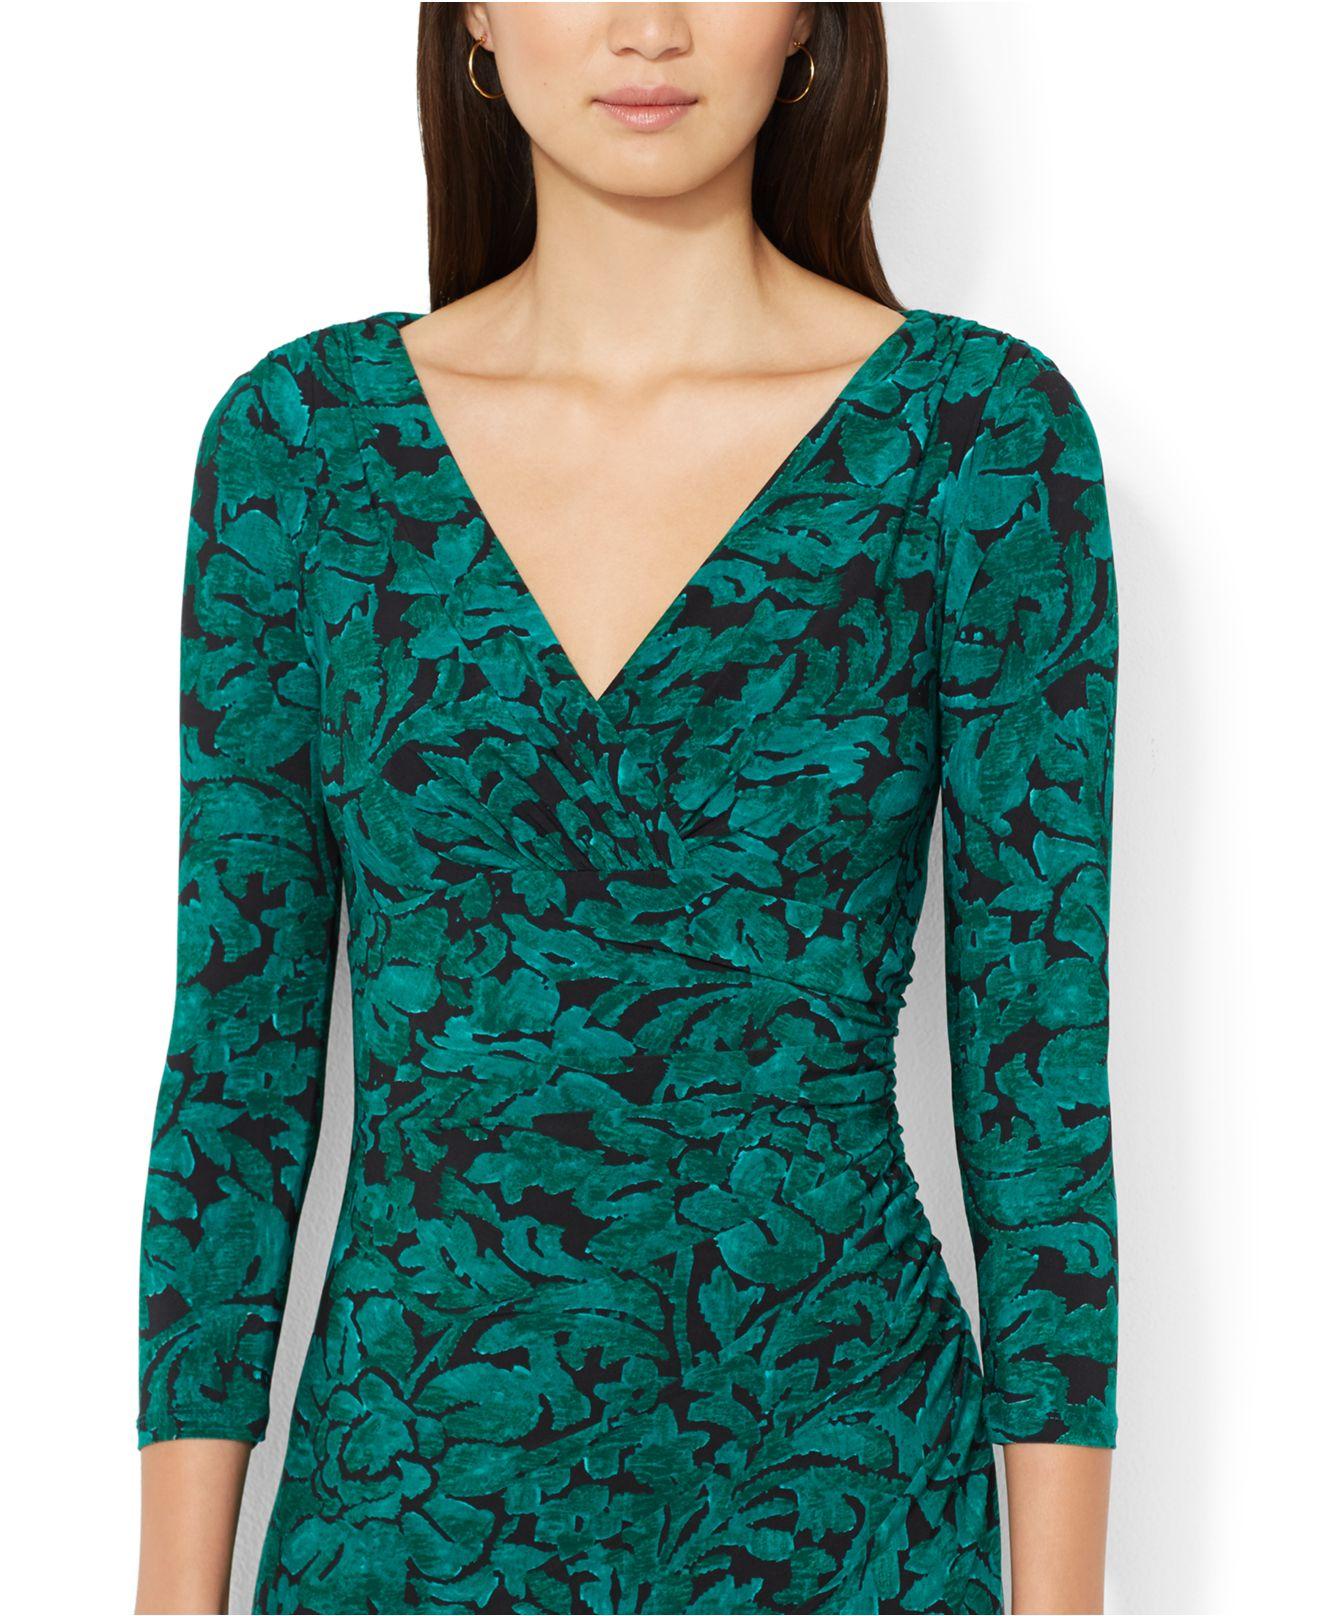 Lauren By Ralph Lauren Floral Print Faux Wrap Dress In